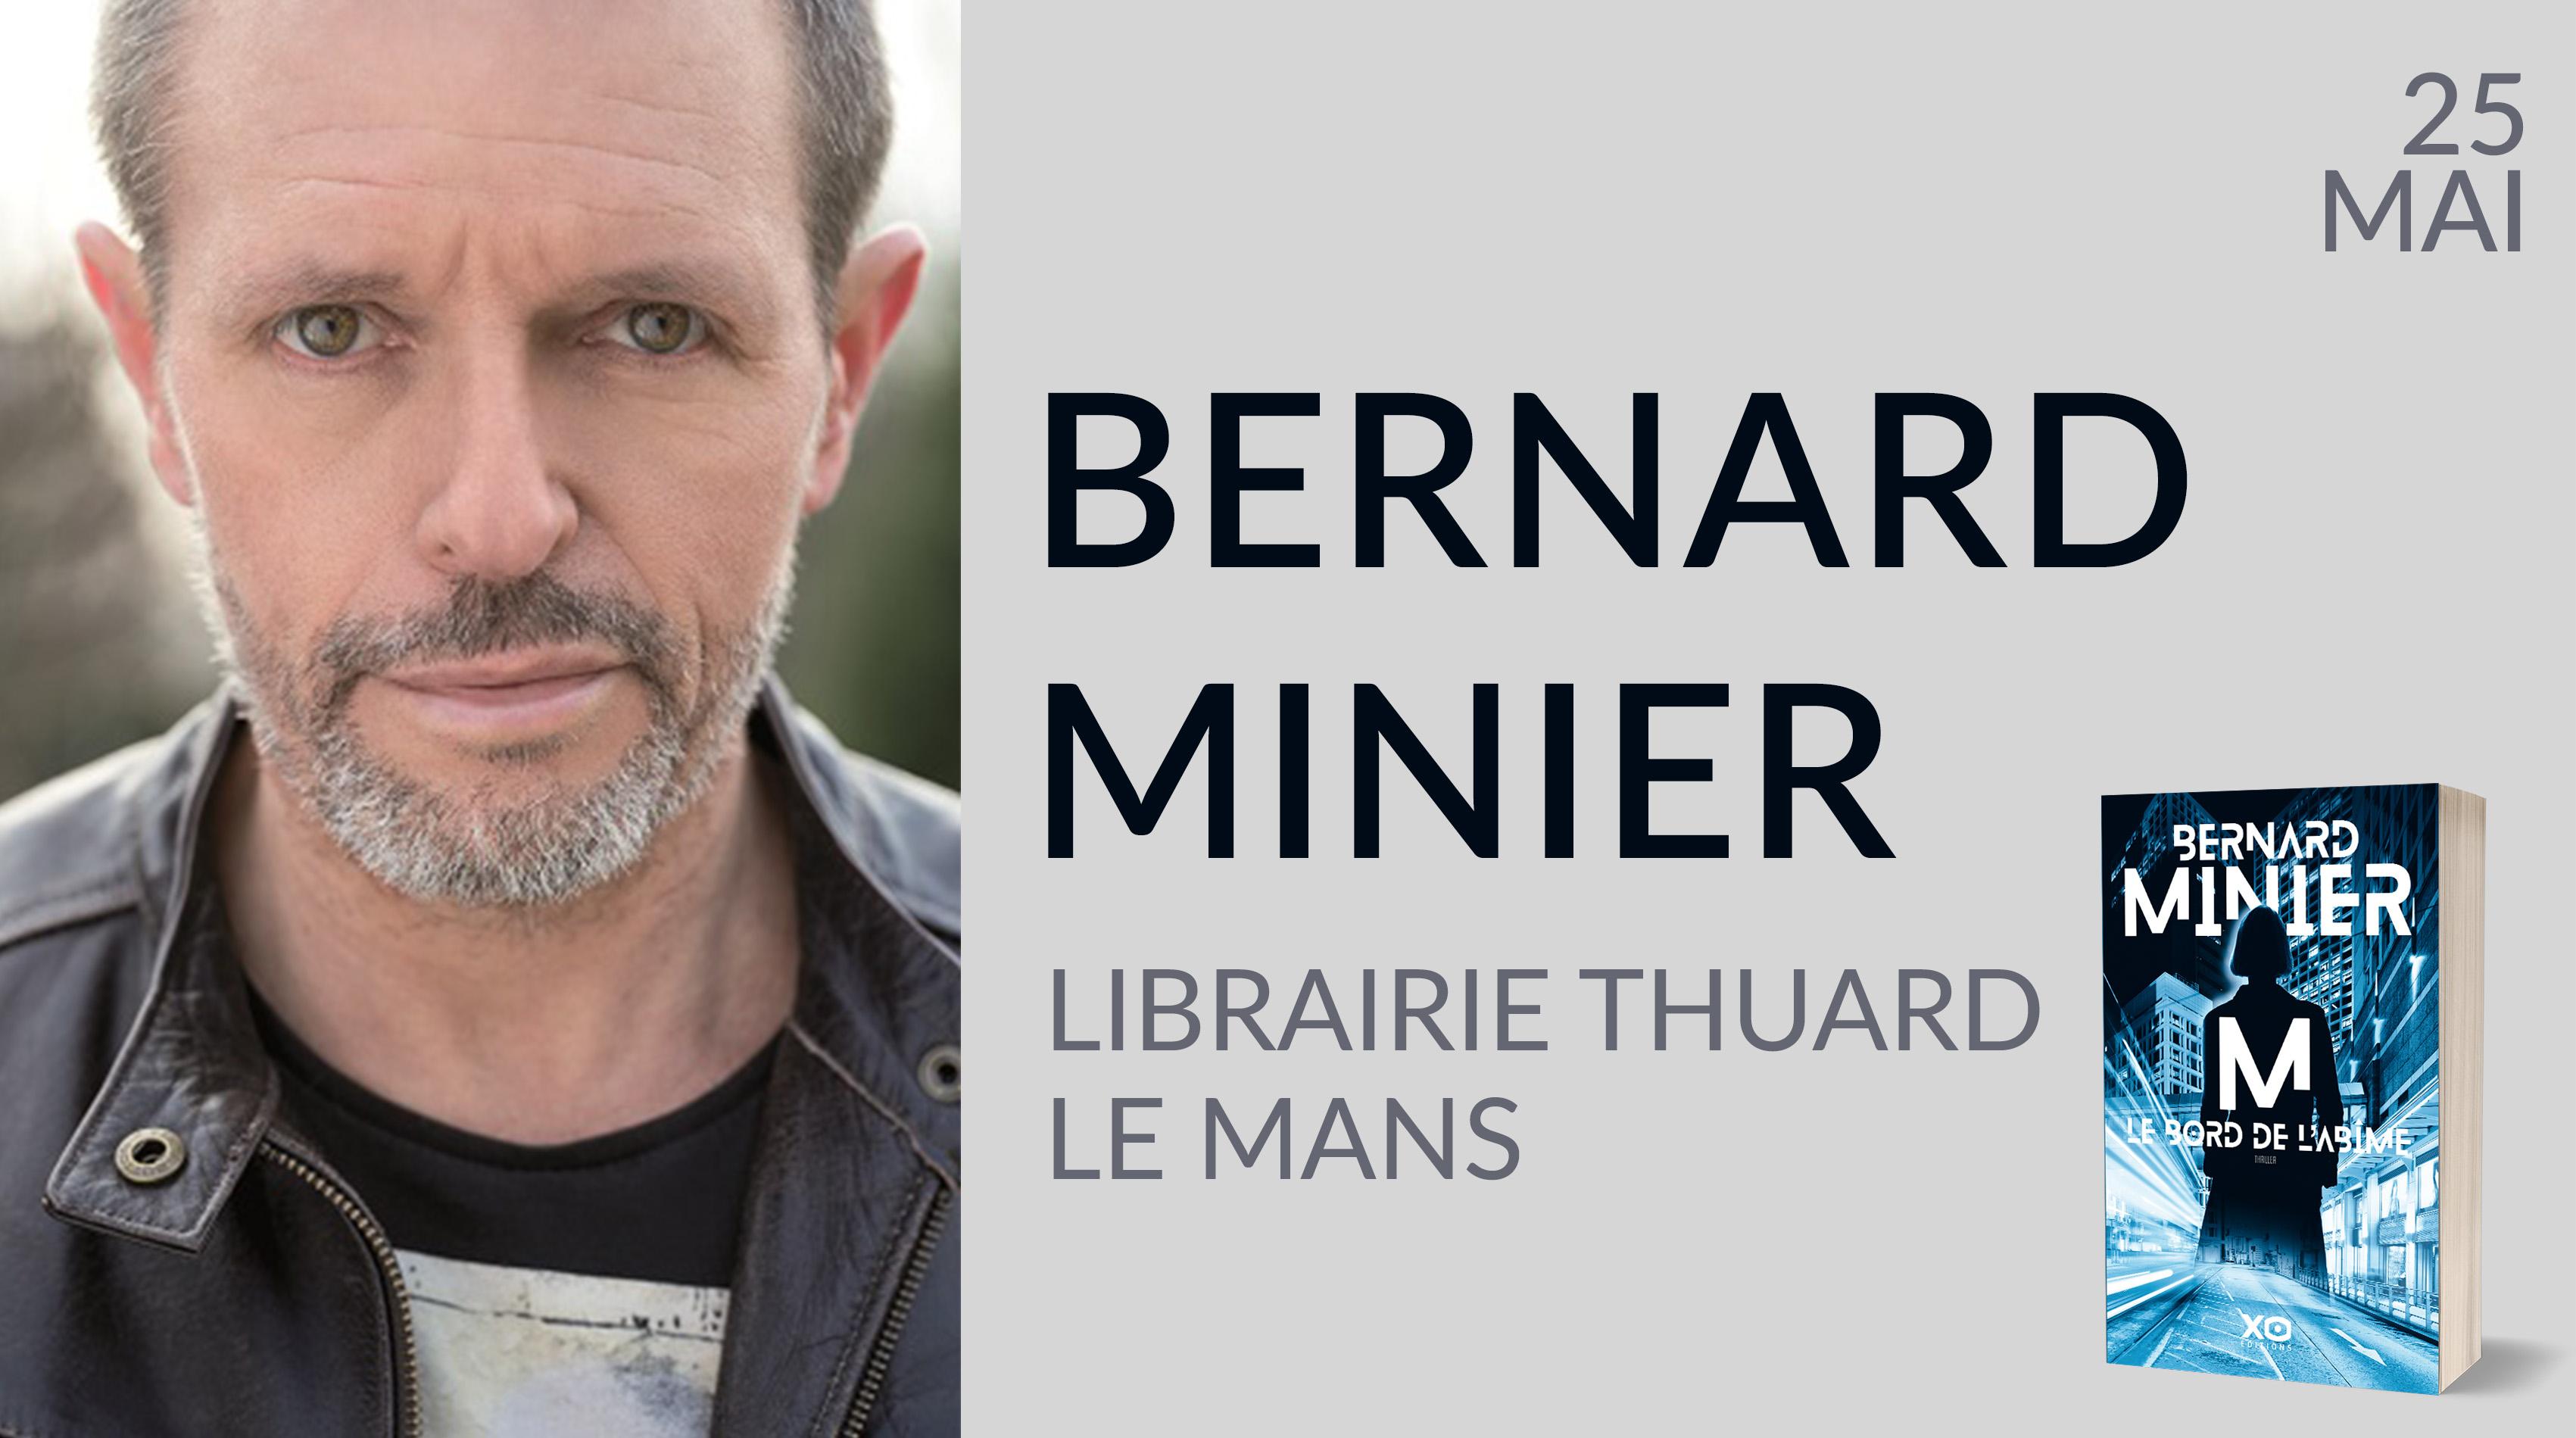 BERNARD MINIER AU MANS